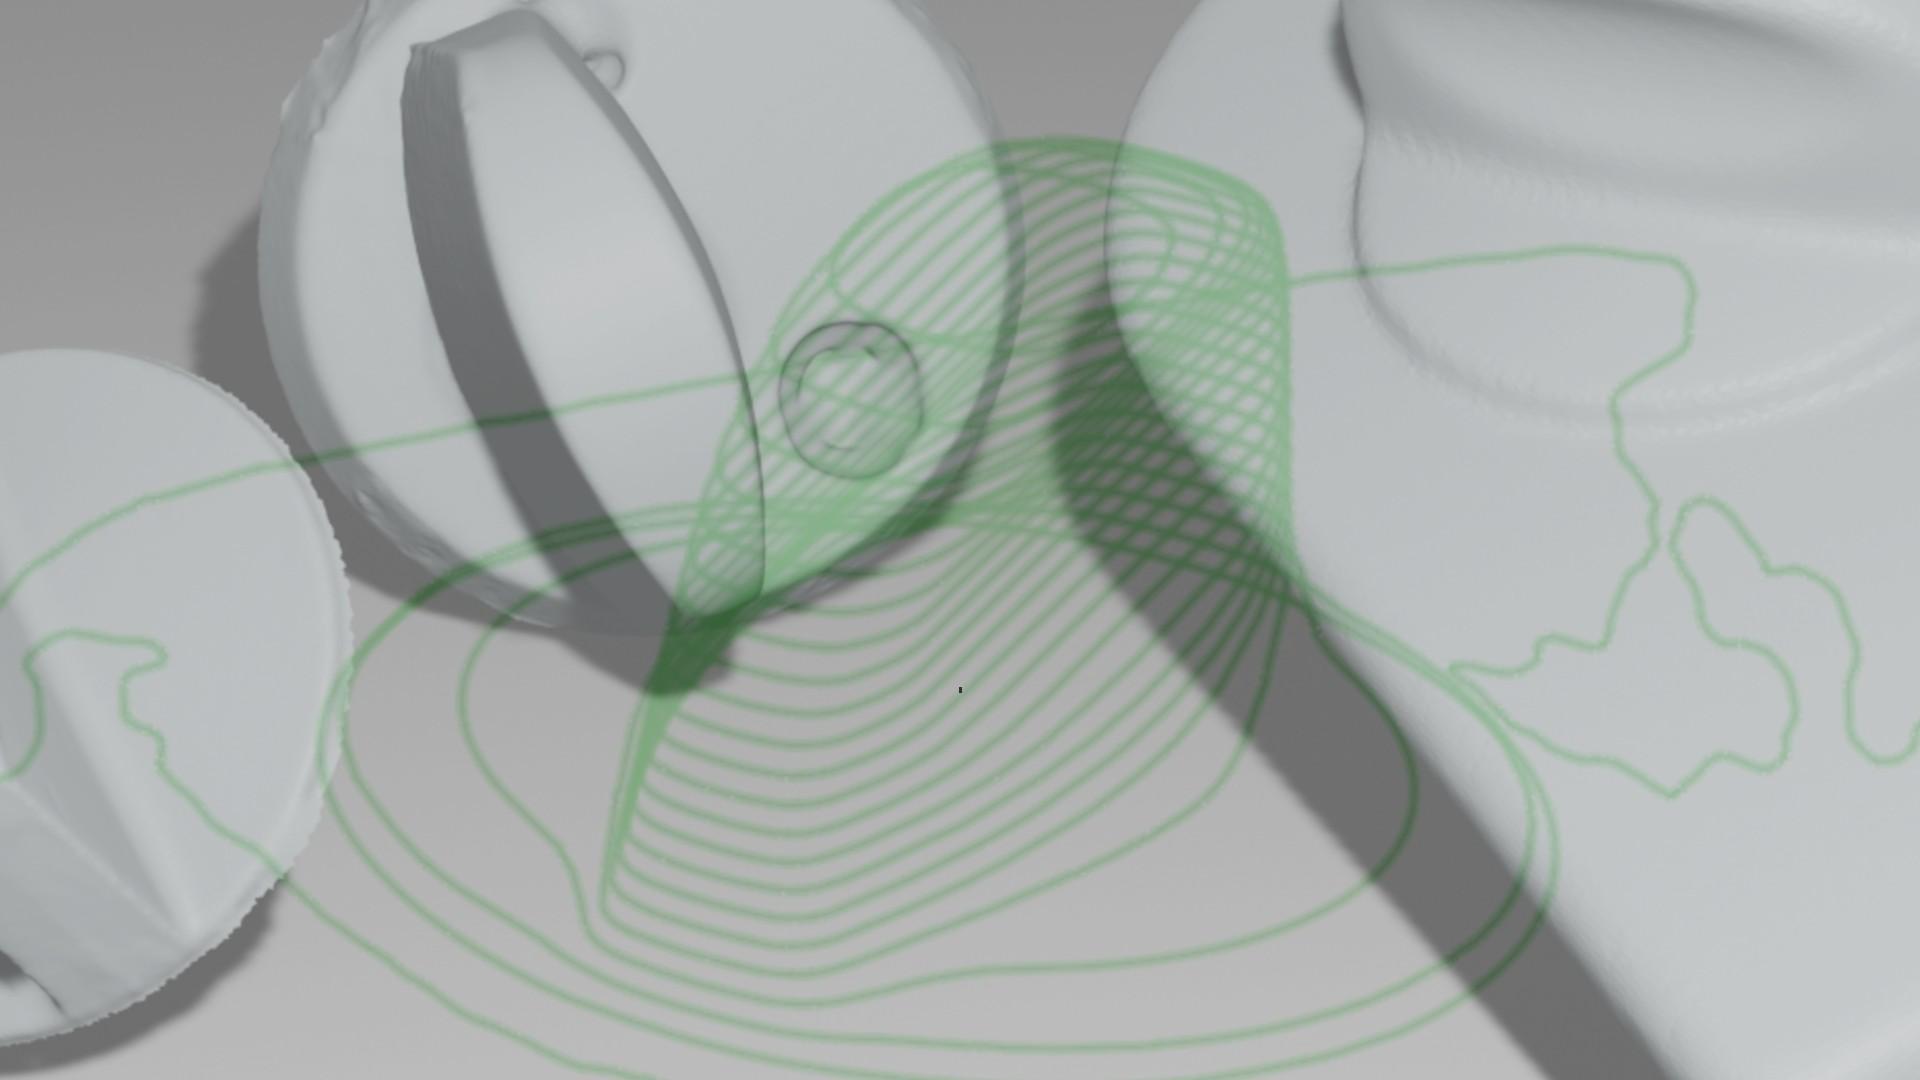 Applications for 3D Scanning – Part 1, Scanning Assisted Designing